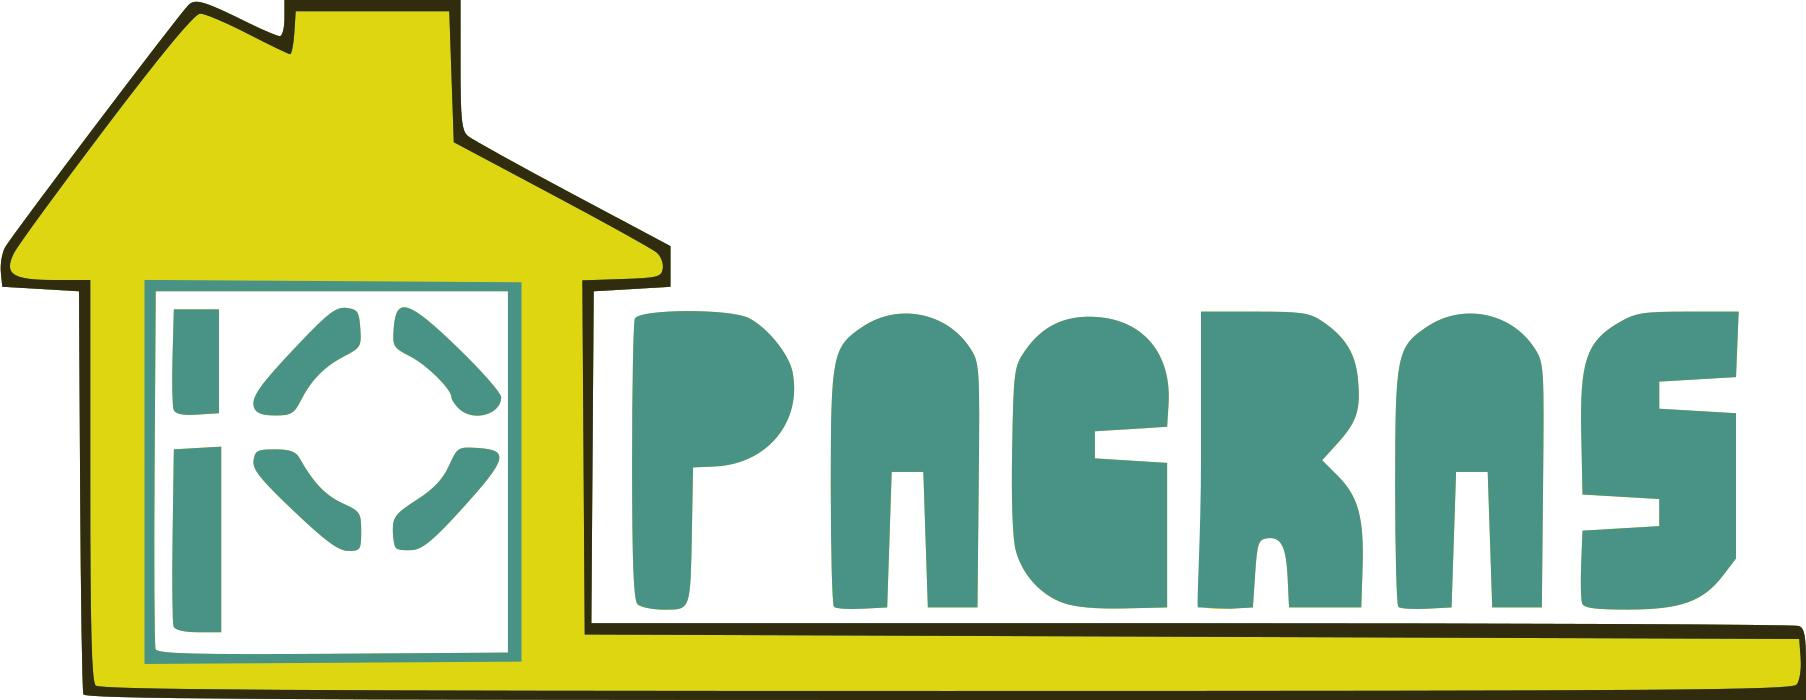 Pagras - logo